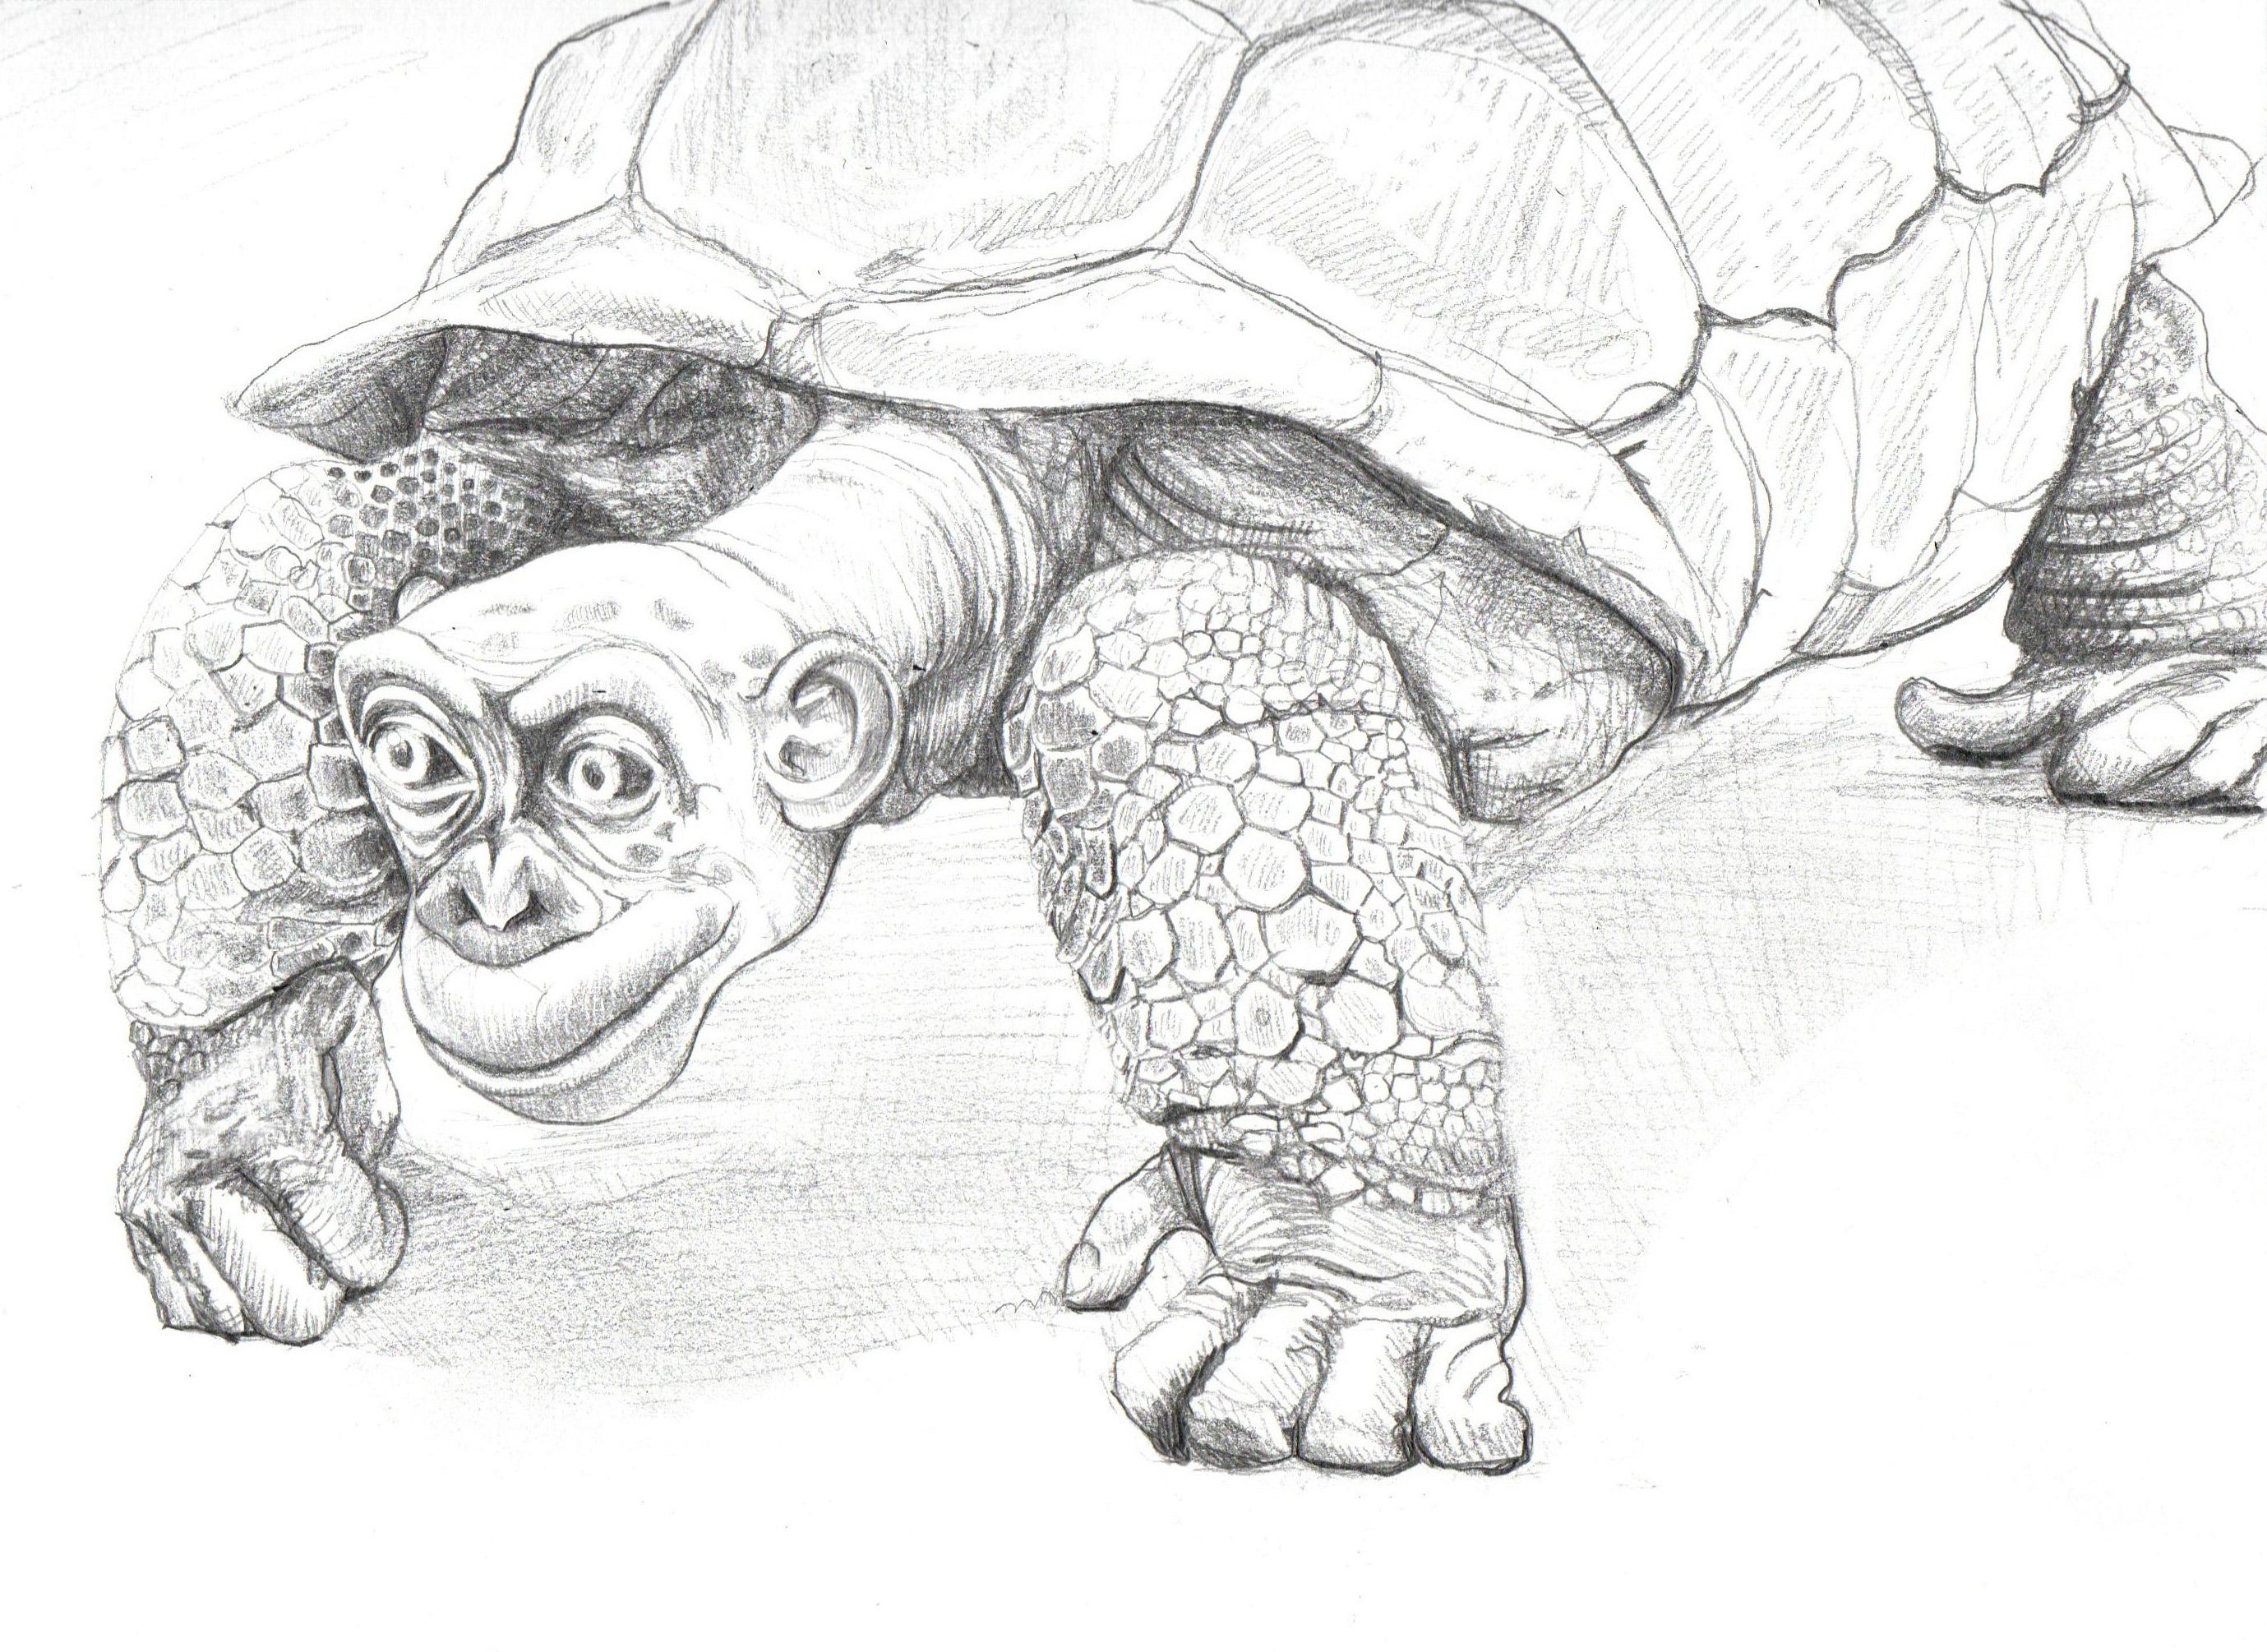 A Rare mashup Gorillortoise Tortilla Gorilla Tortoise hybrid beast pencil Nicole Little animal mashup